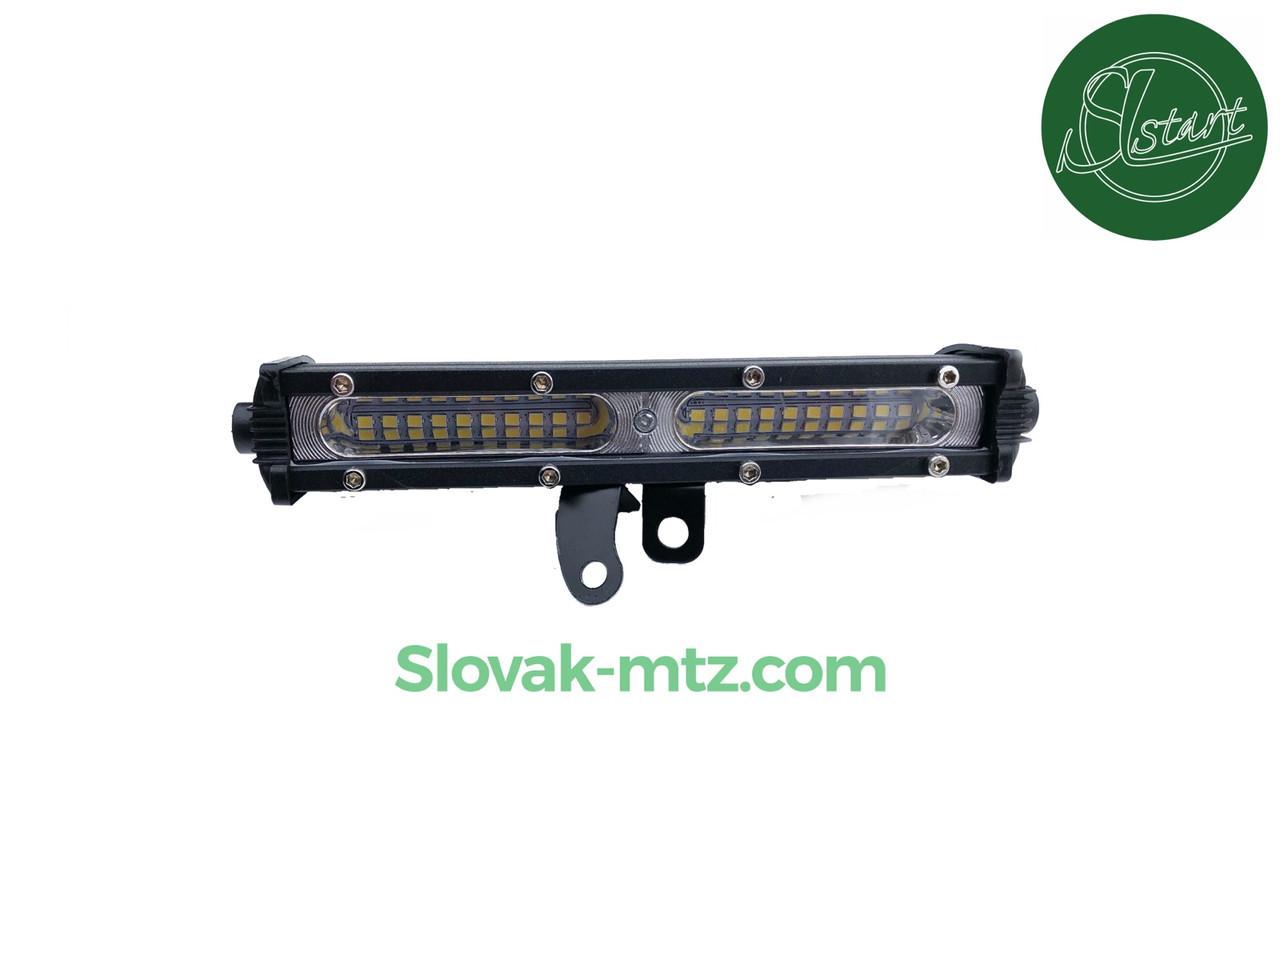 Светодиодная LED фара 40Вт  (светодиоды 3w x20шт)